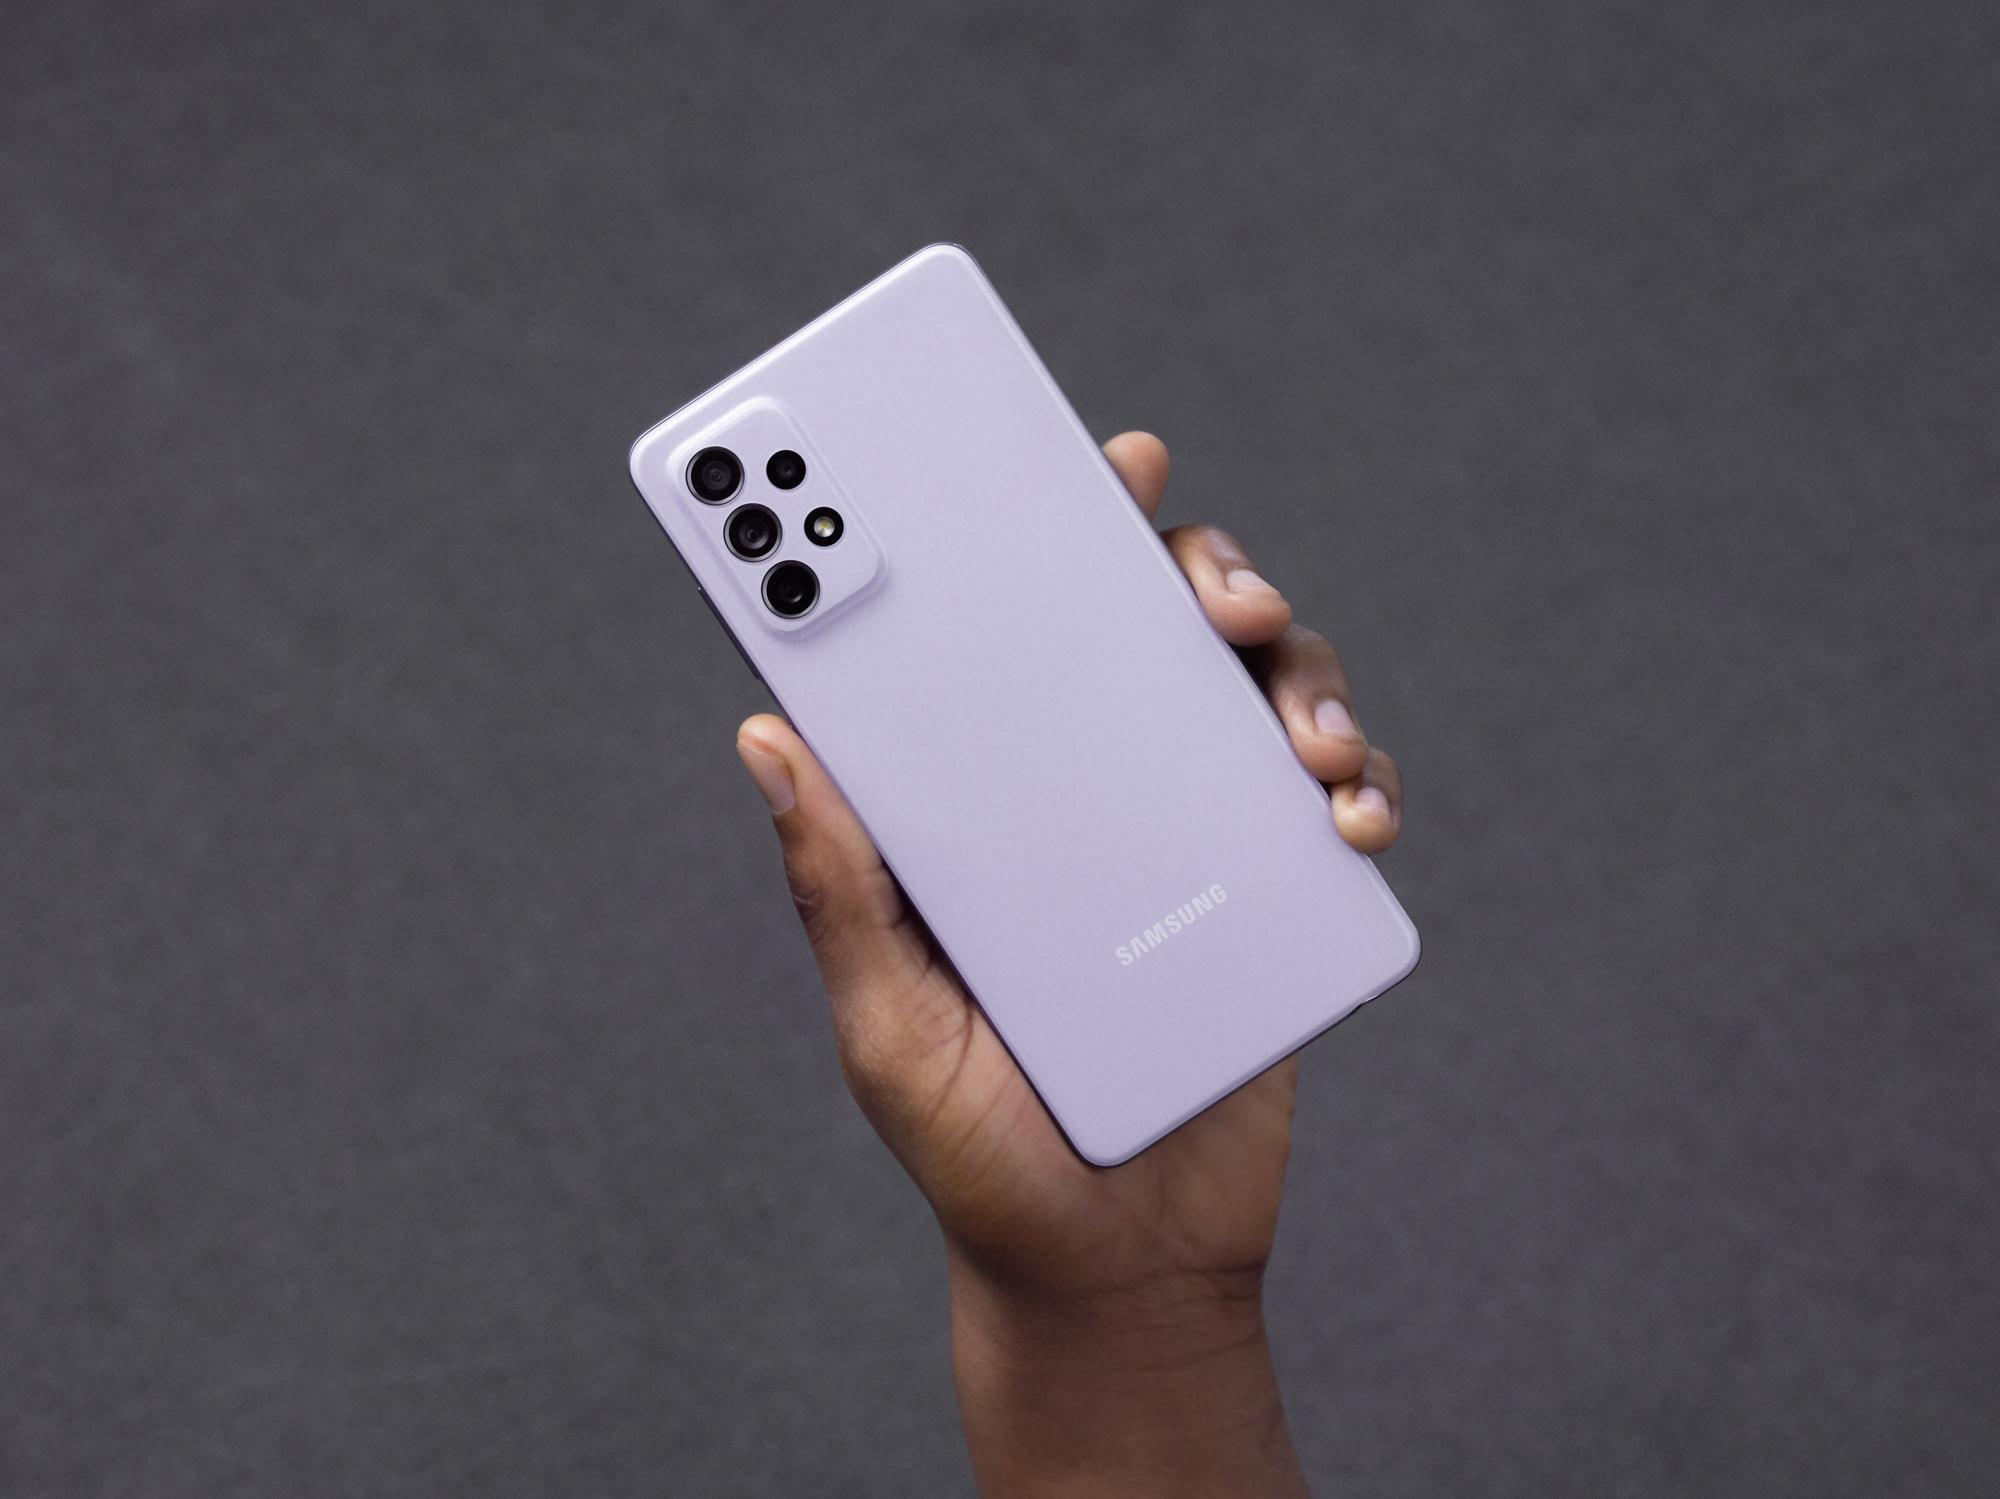 Samsung Galaxy A52 - Official Look